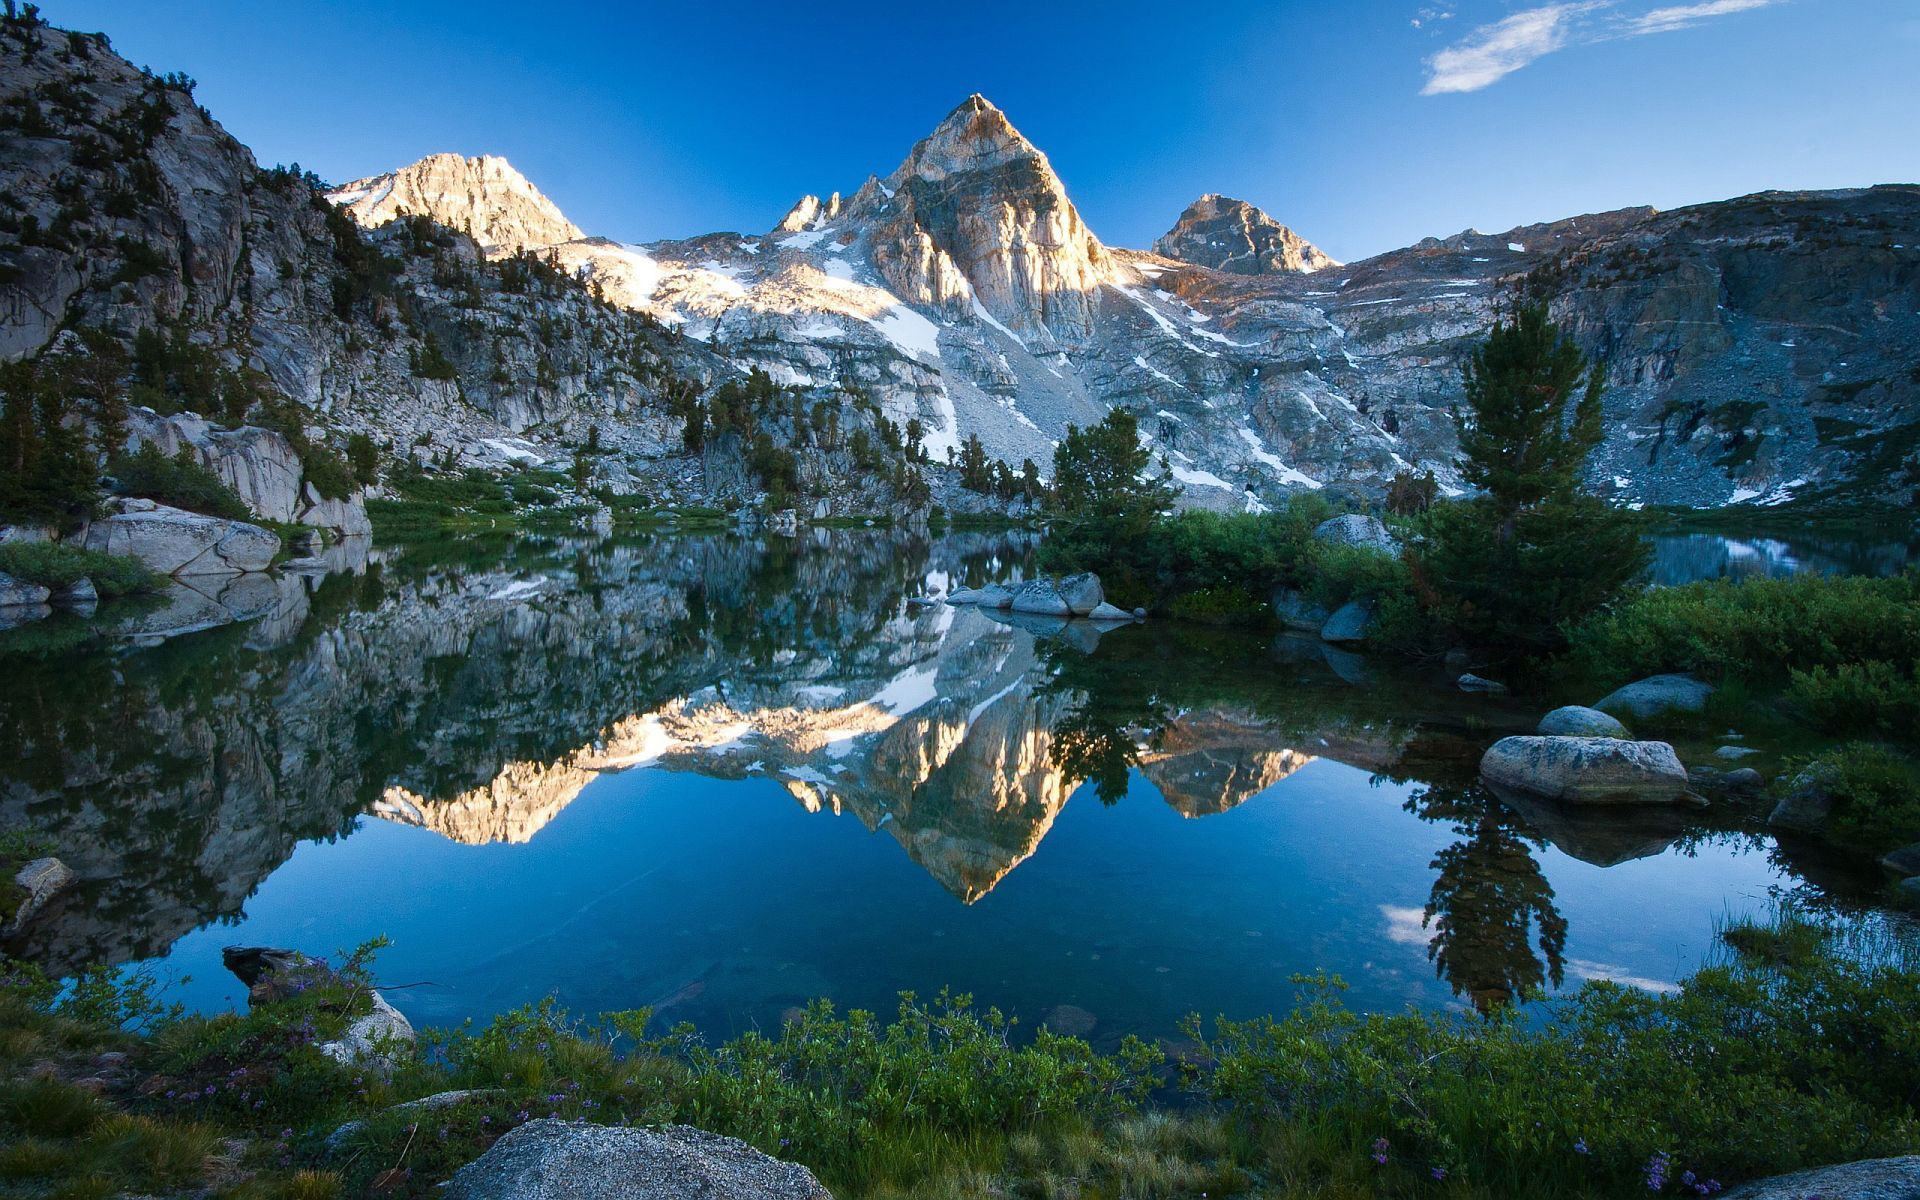 Mountain Scenery Wallpapers Top Free Mountain Scenery